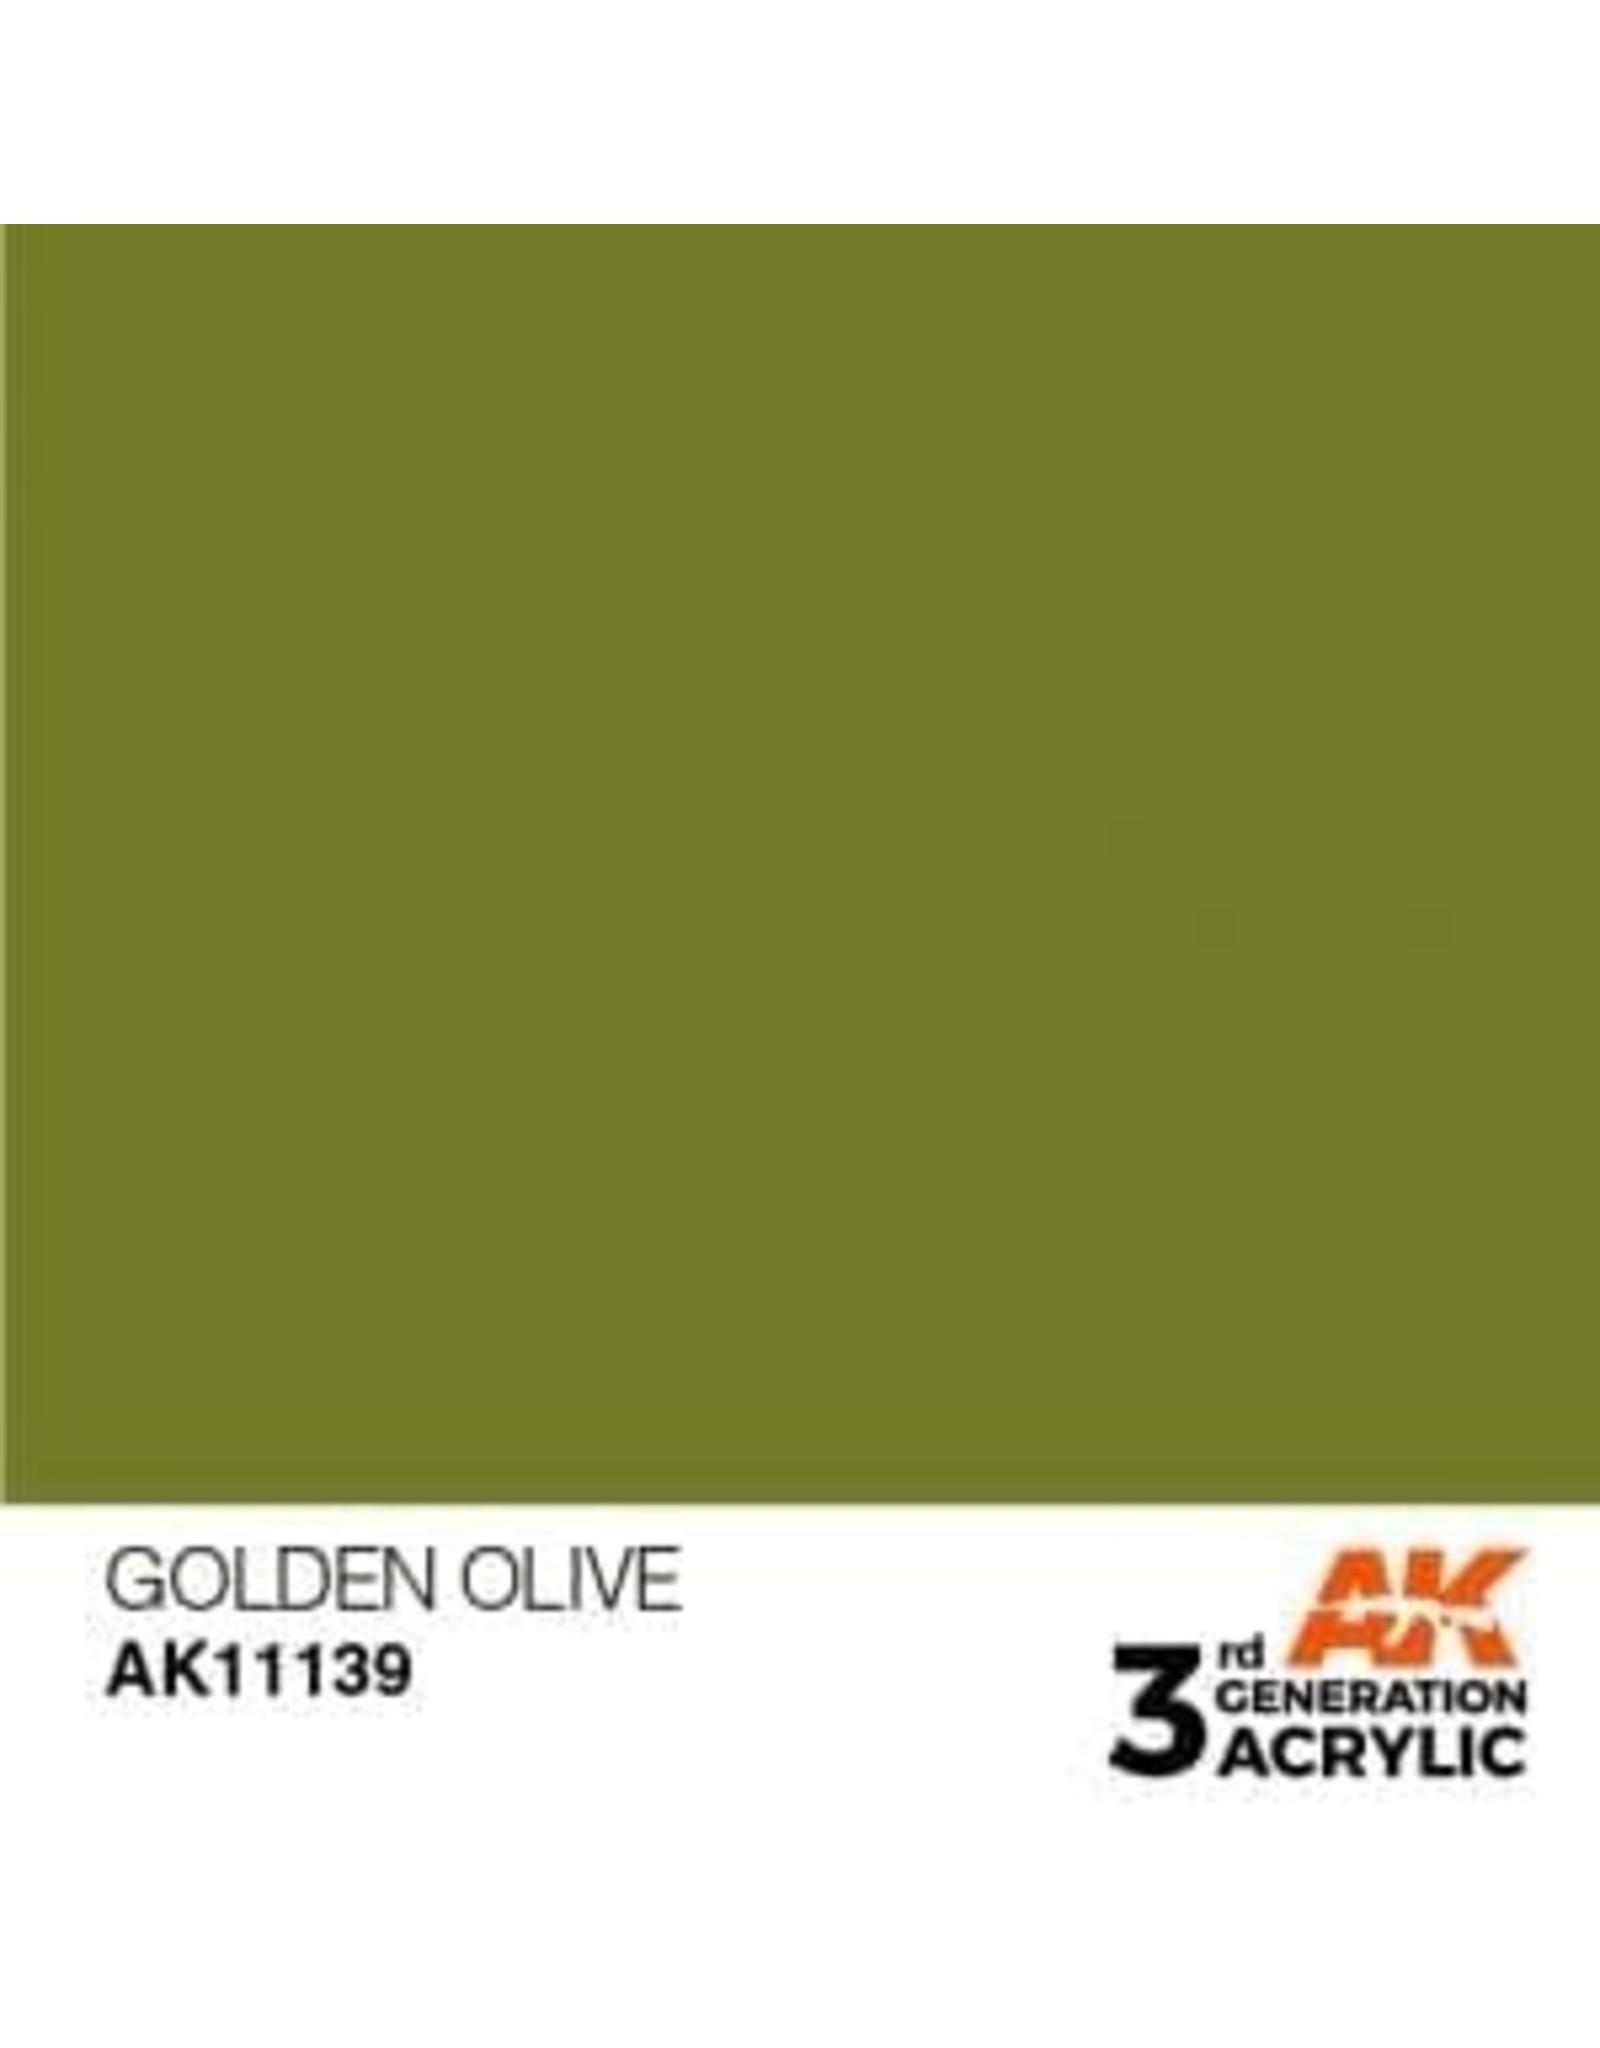 AK Interactive 3RD GEN ACRYLIC GOLDEN OLIVE 17ML